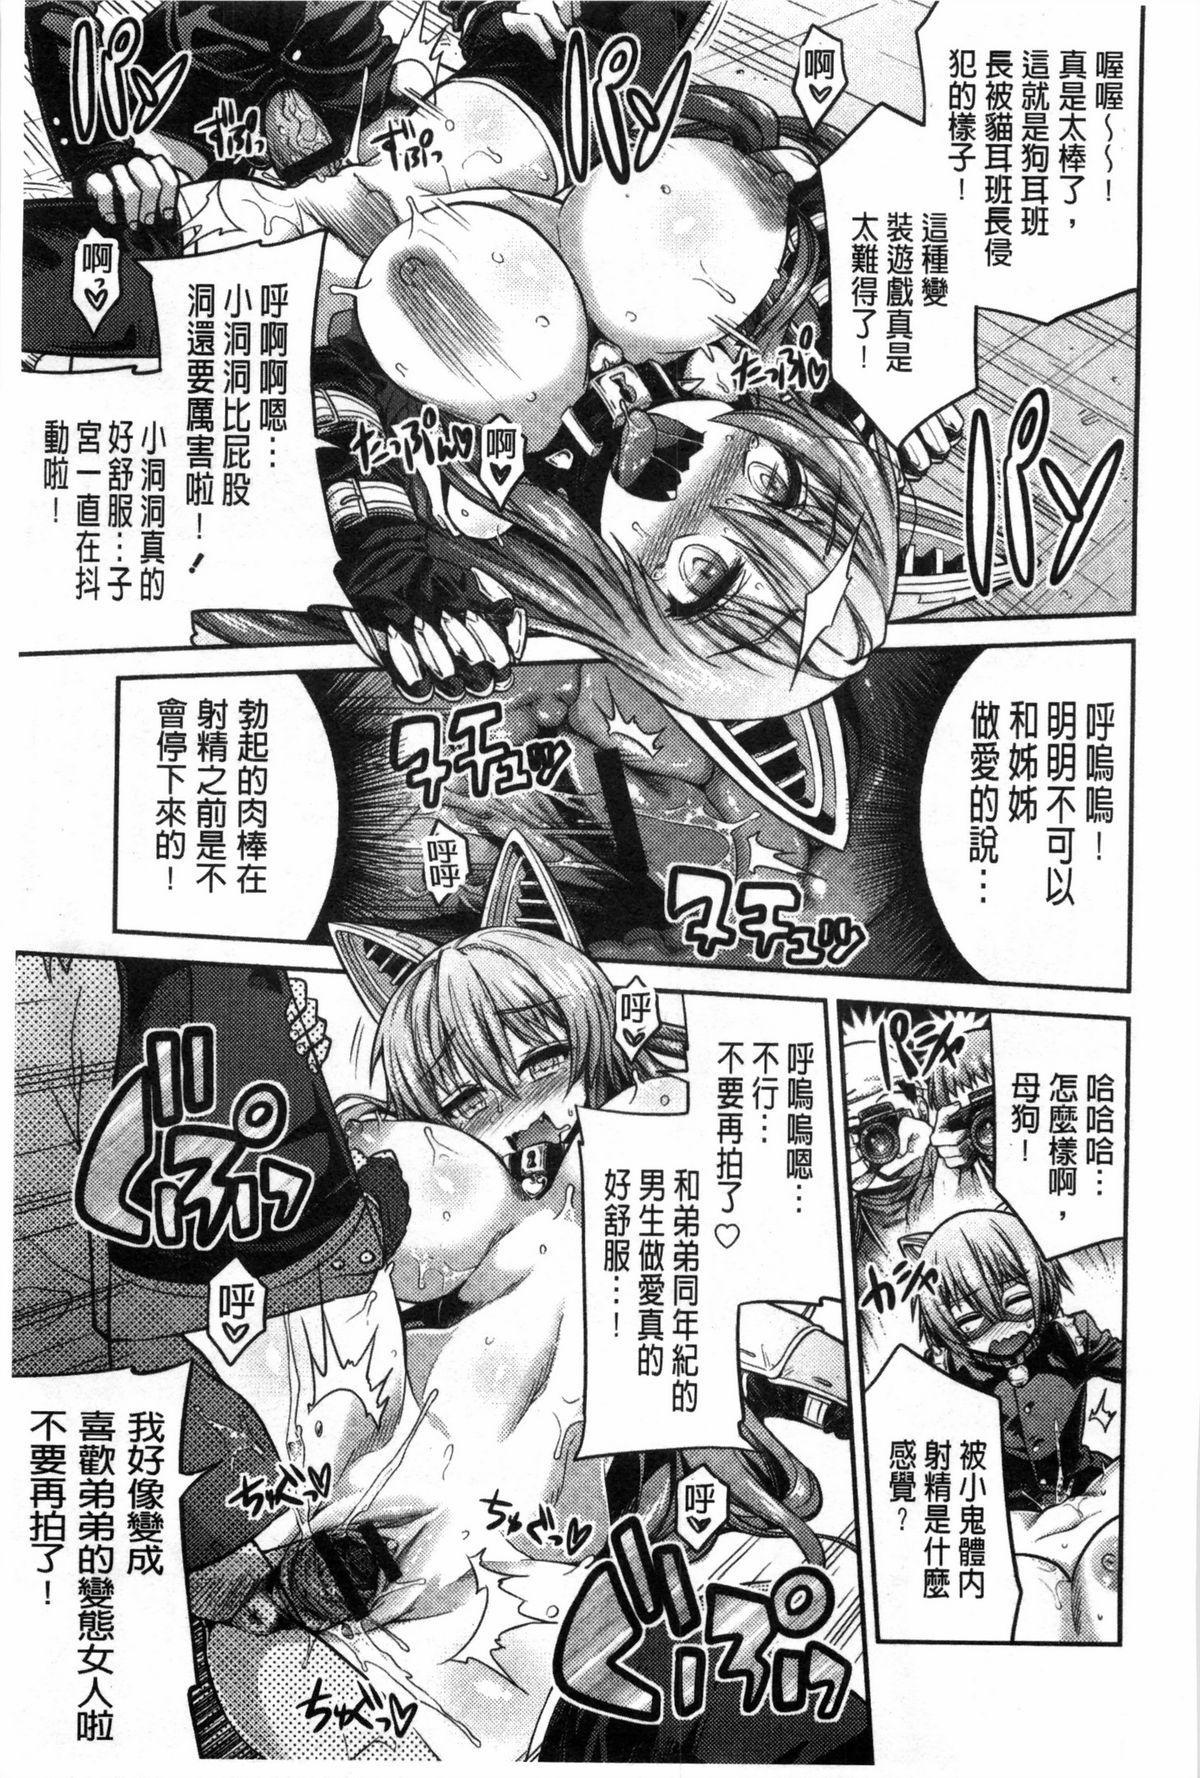 Man x Koi - Ero Manga de Hajimaru Koi no Plot   A漫×戀情 由情色漫畫所萌生的戀之物語 183